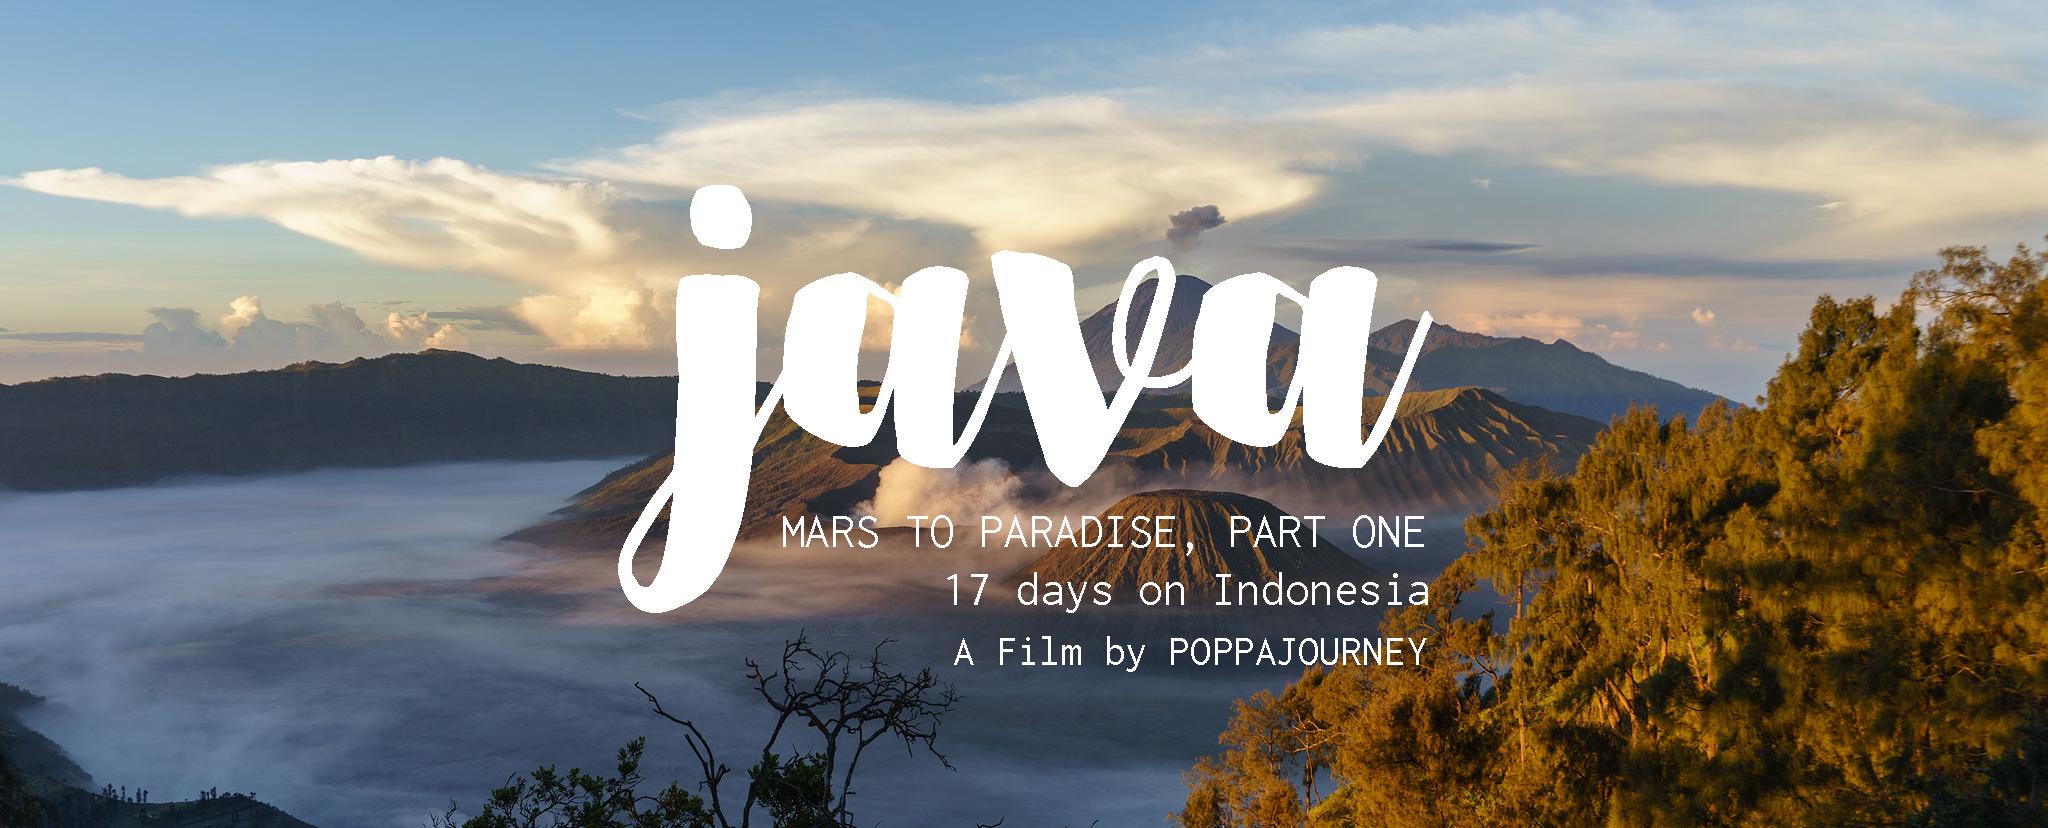 Mars to Paradise , Part One : JAVA (เดินเล่นบนดาวอังคาร)